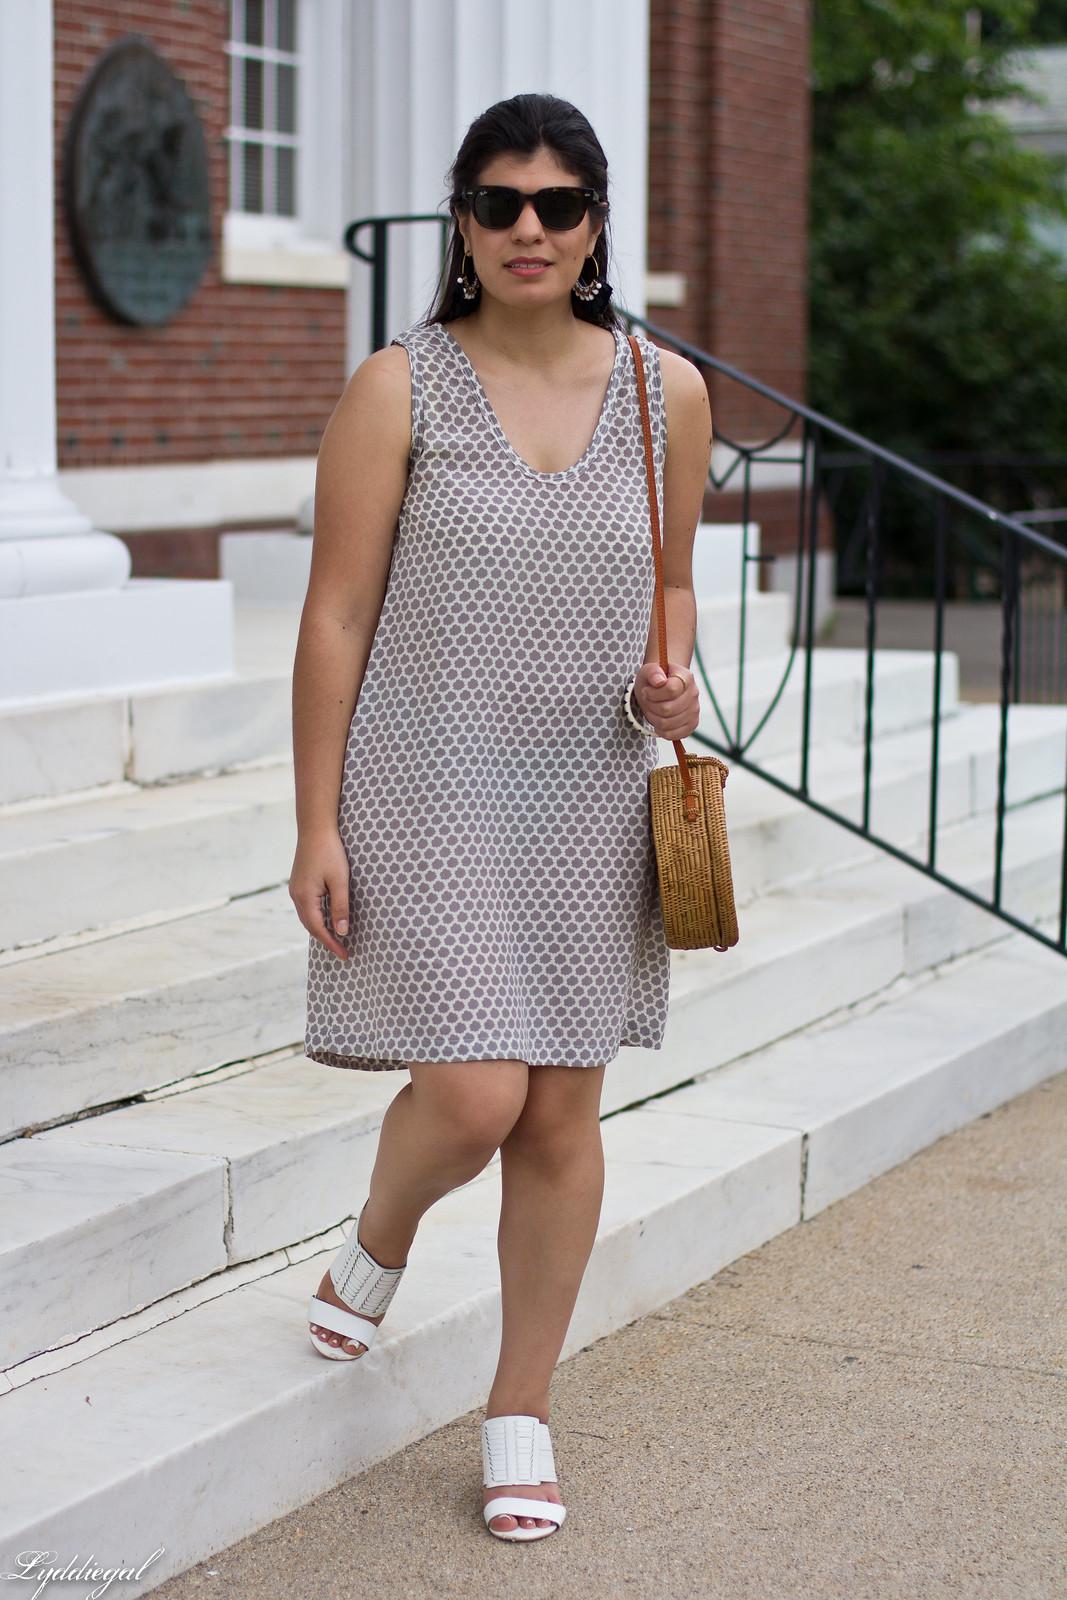 joie cloudburst dress, round straw bag, statement earrings-2.jpg